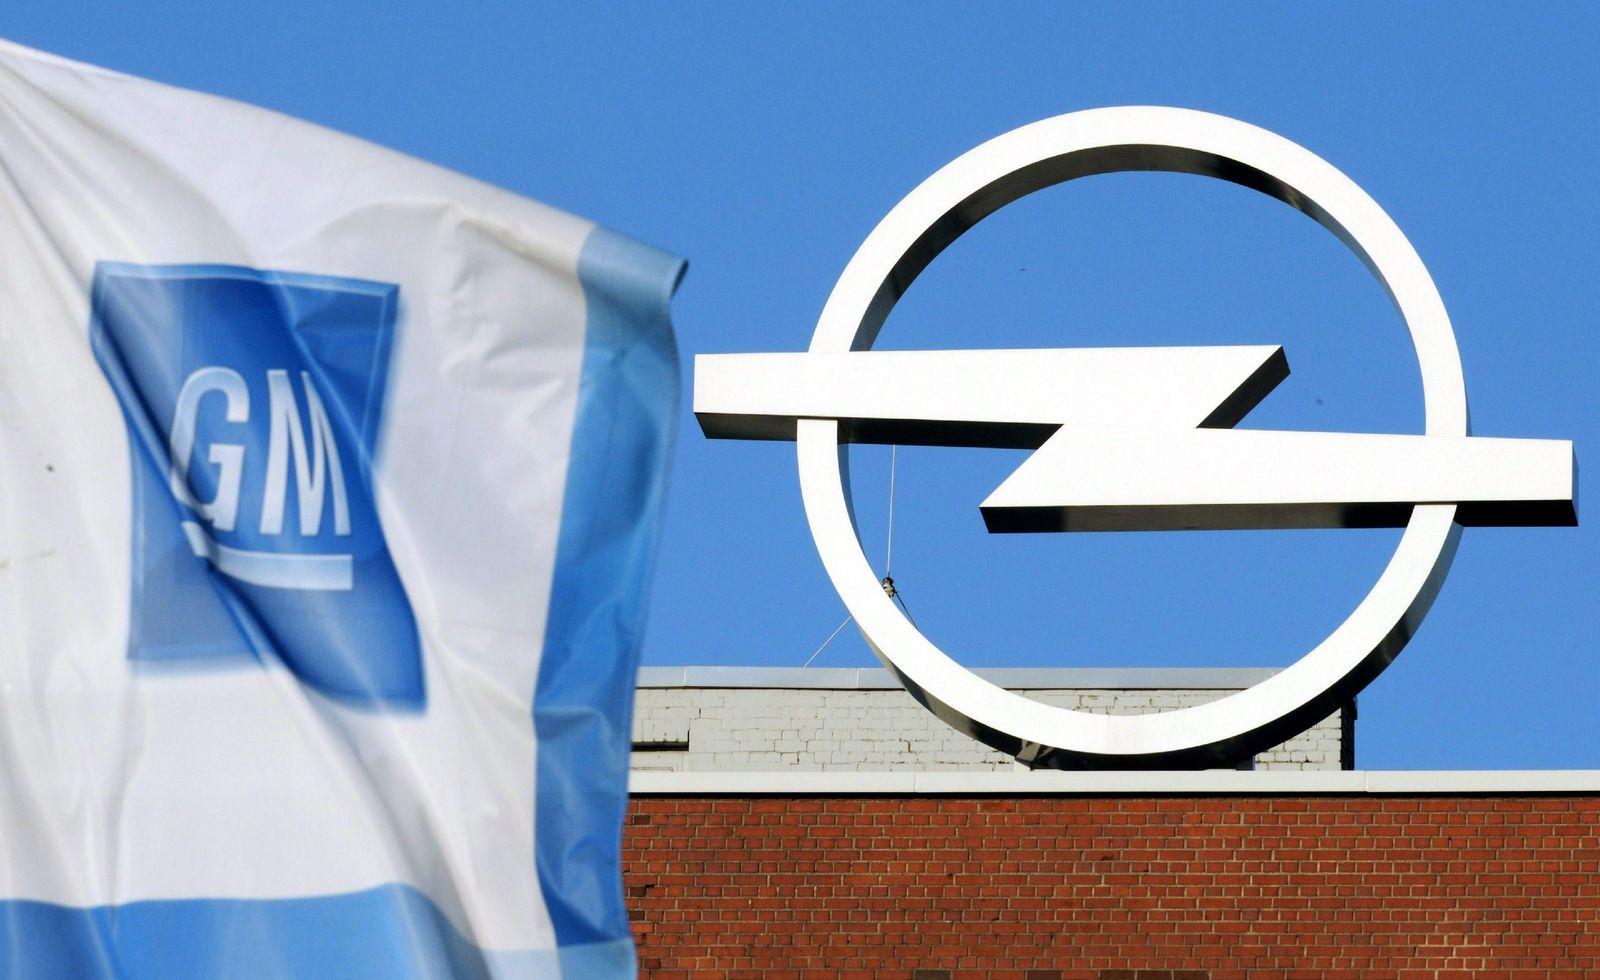 Opel Logo / GM Fahne